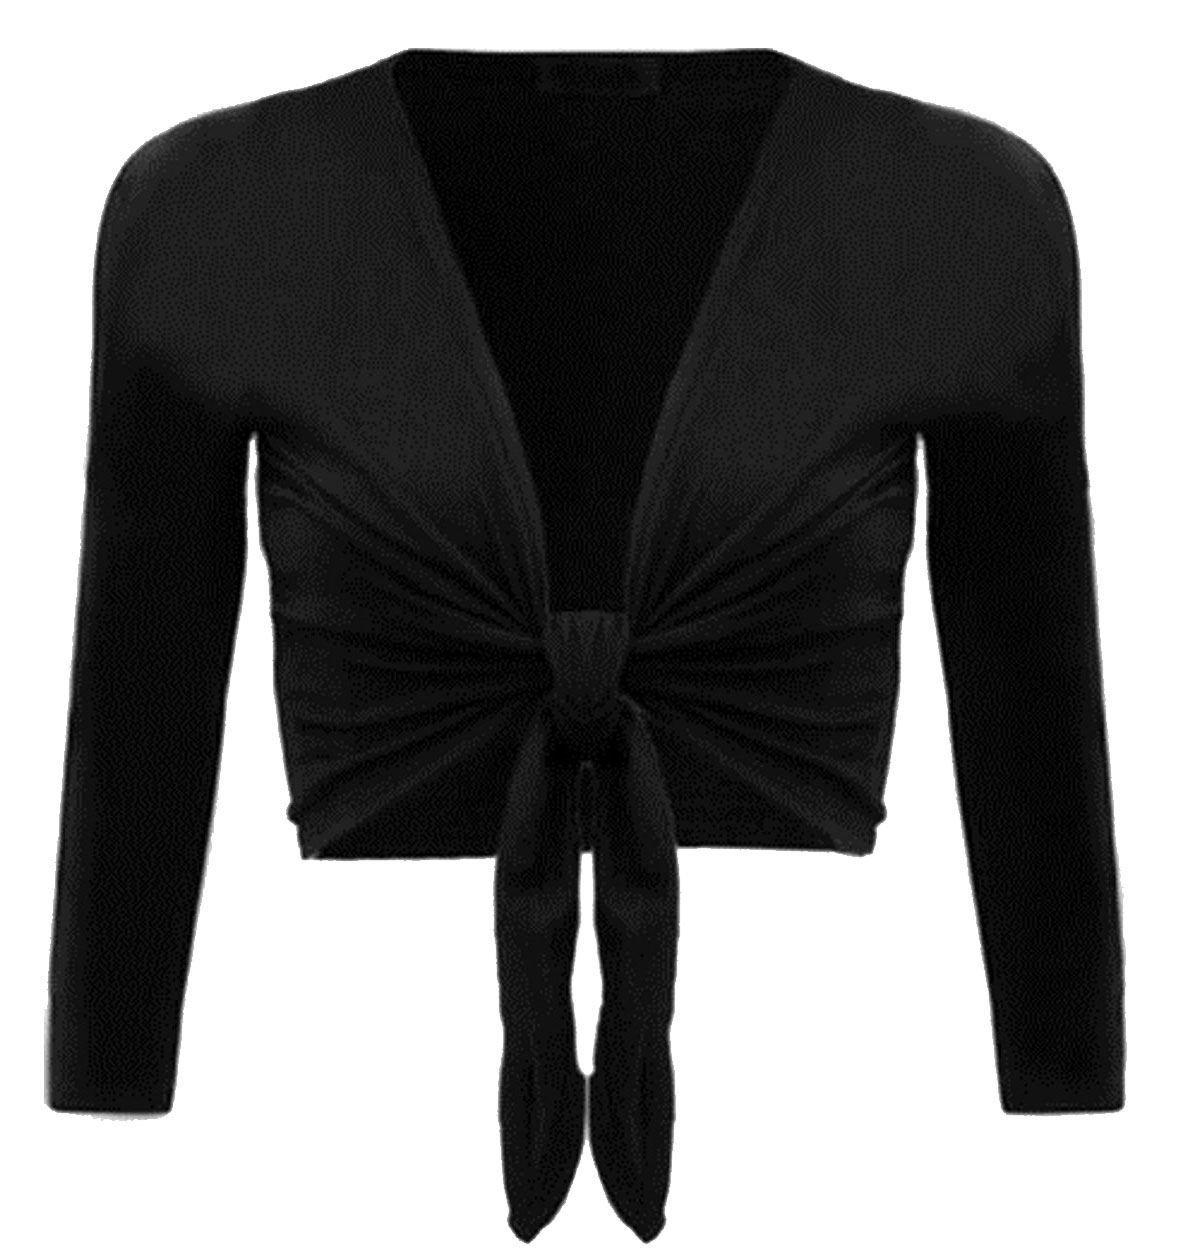 PurpleHanger Women's Long Sleeve Bolero Shrug Open Crop Cardigan Black 12